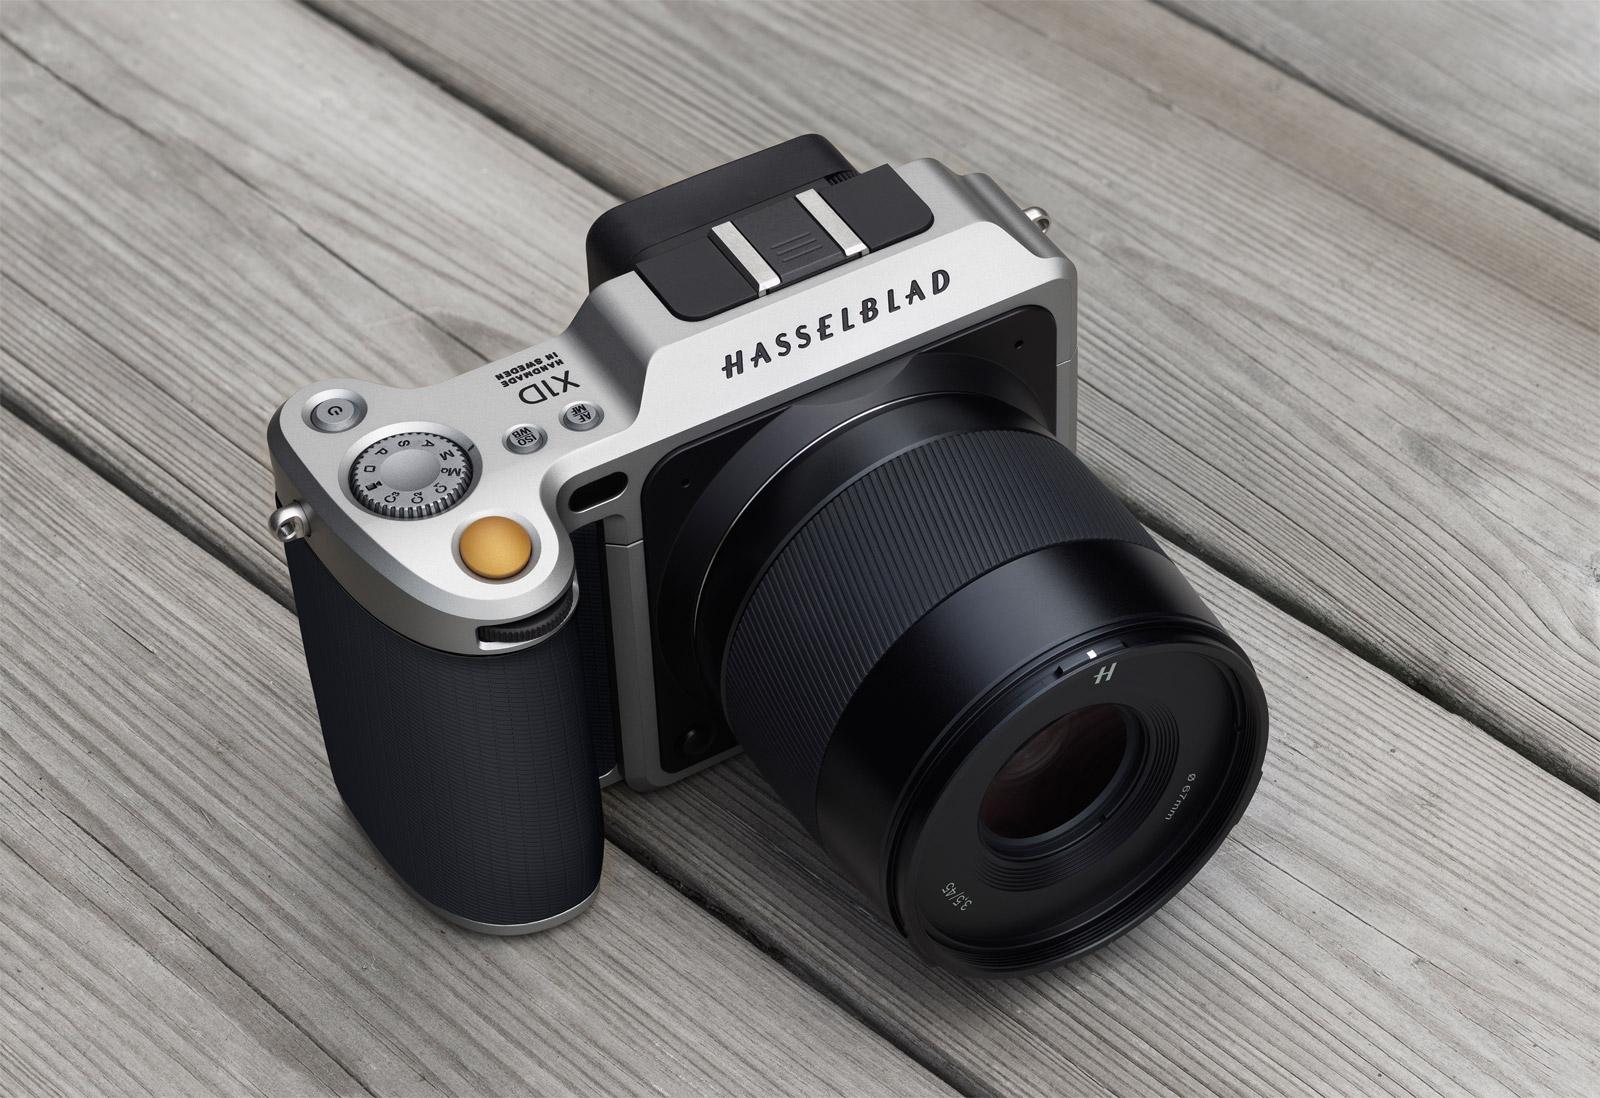 Hasselblad X1D The World's First Compact Mirrorless Digital Medium Format Camera 4